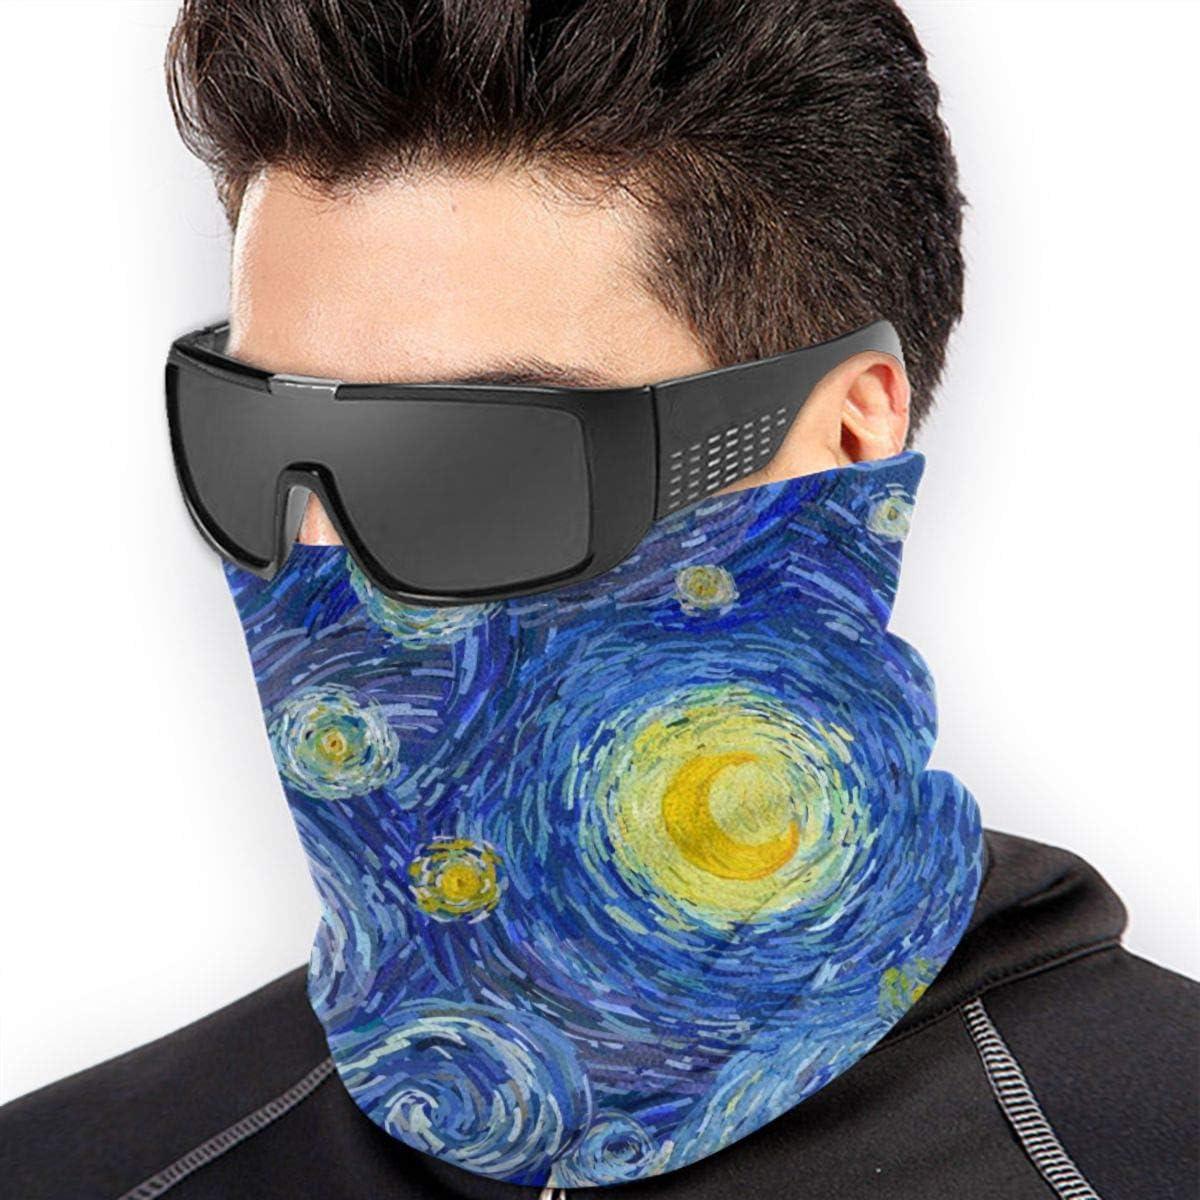 Akhy Multifunctional Headwear Face Mask Headband Neck Gaiter Happy Sloth Balaclava for Men and Women